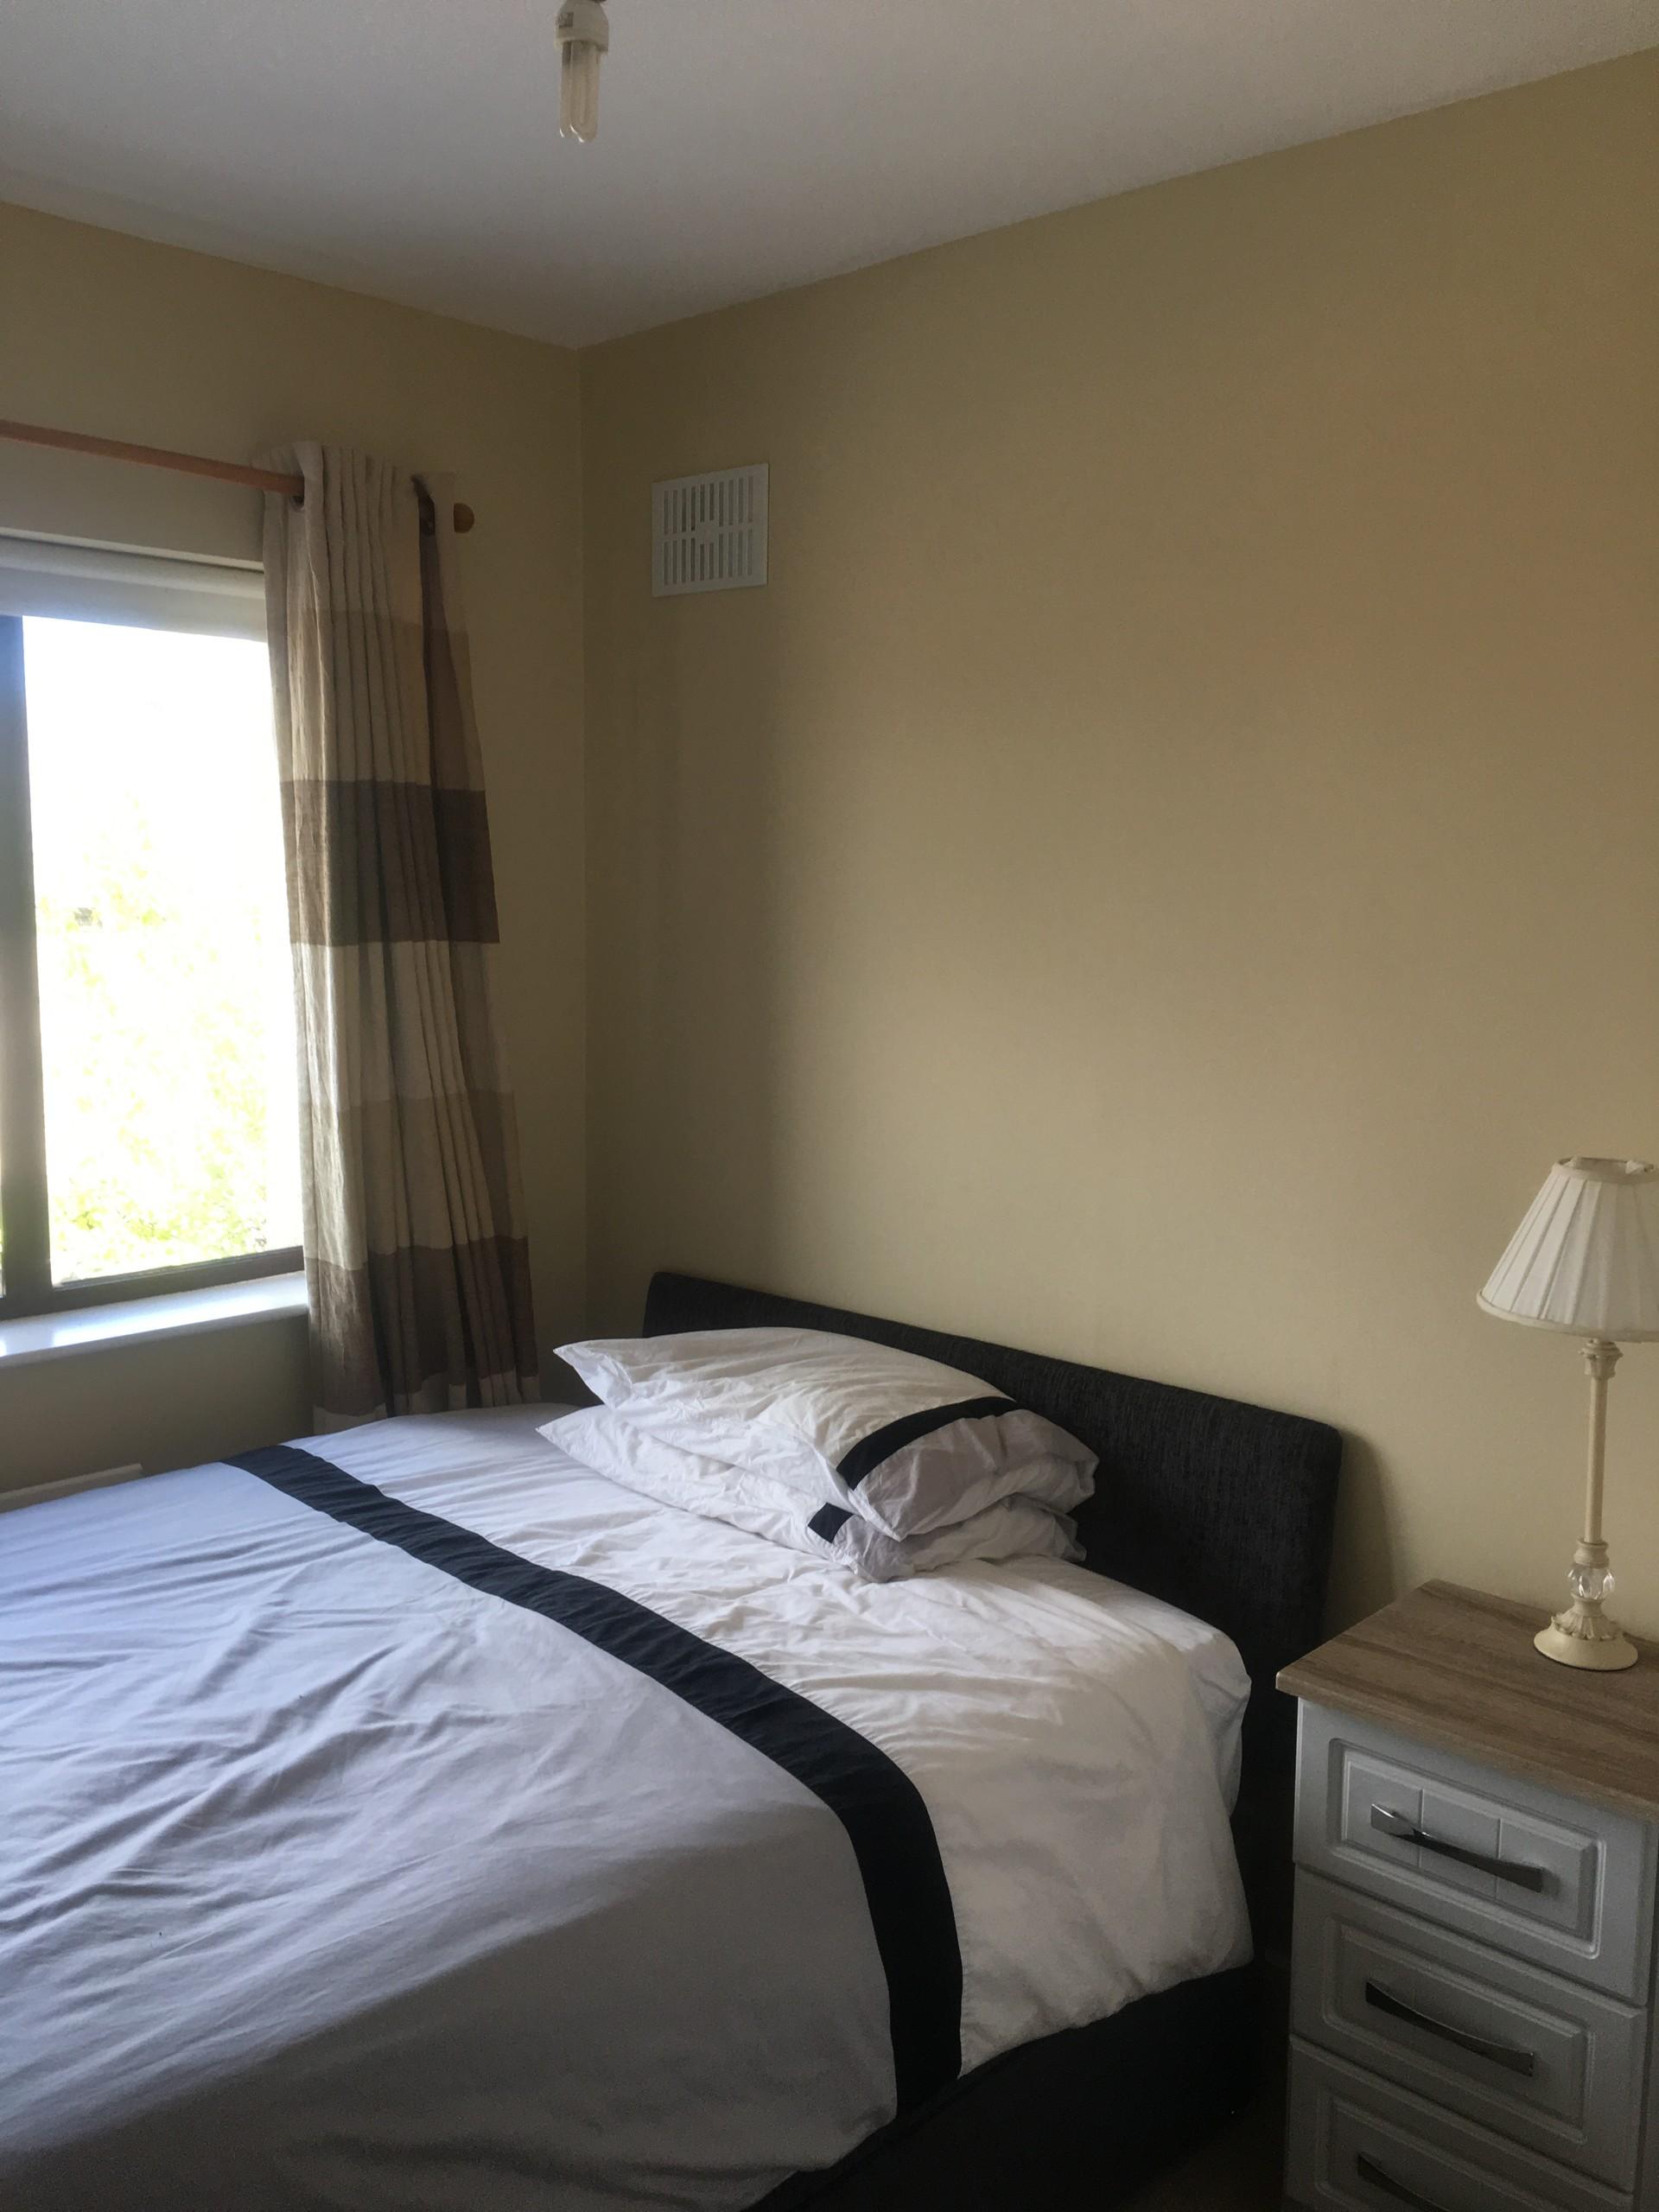 2-beautiful-large-double-bed-rooms-b095b9fe7fef15e1c2b25bee0207ba40